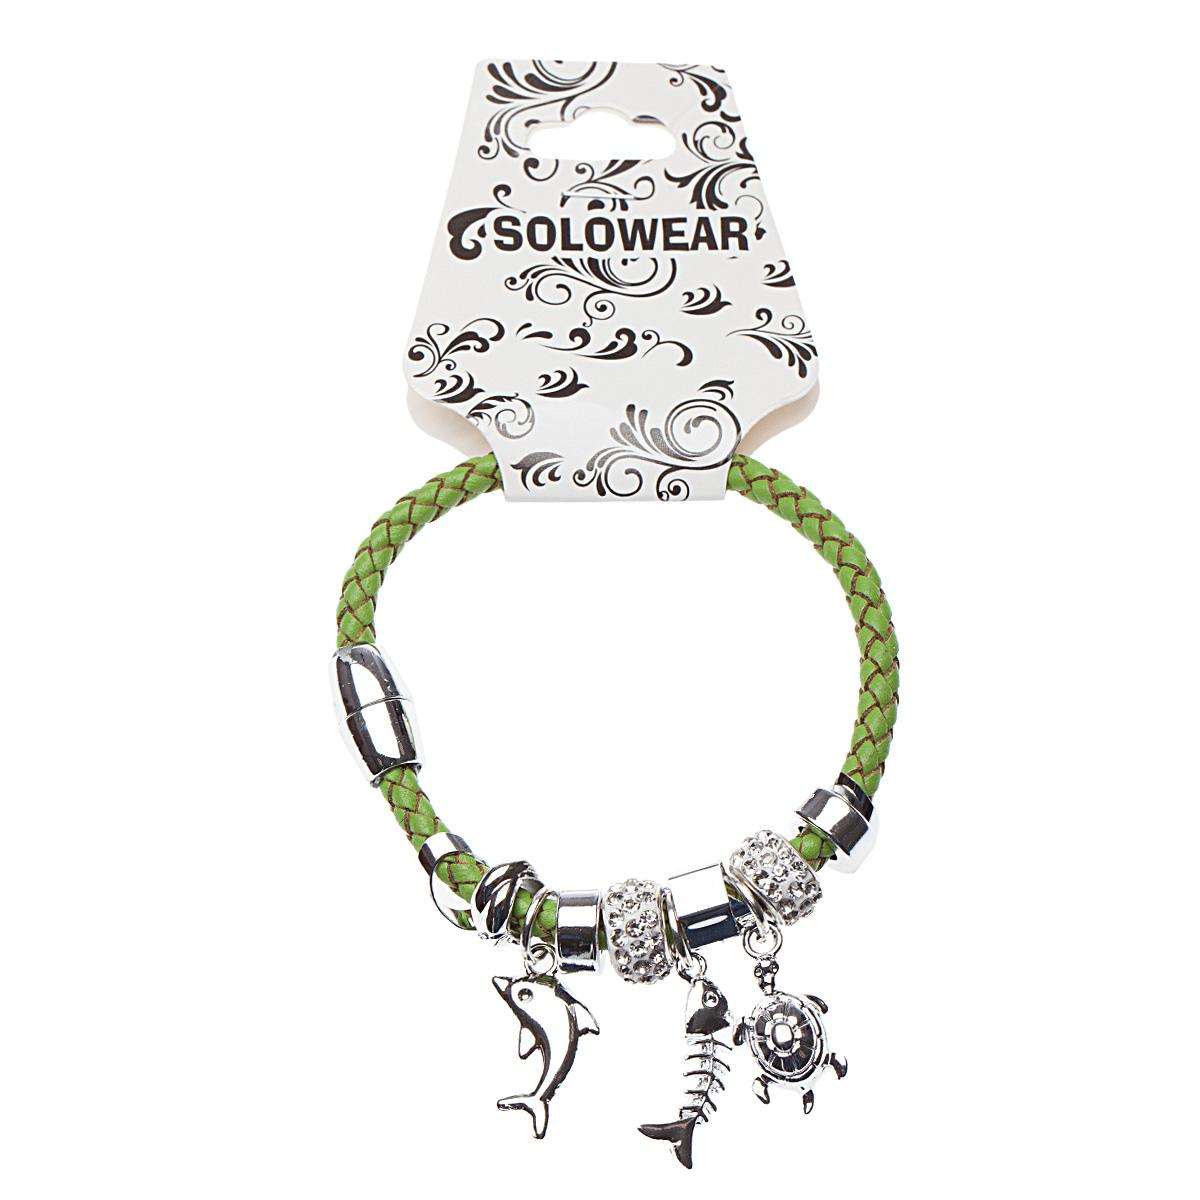 Браслет Solowear, 4620-11 браслет solowear 4620 7